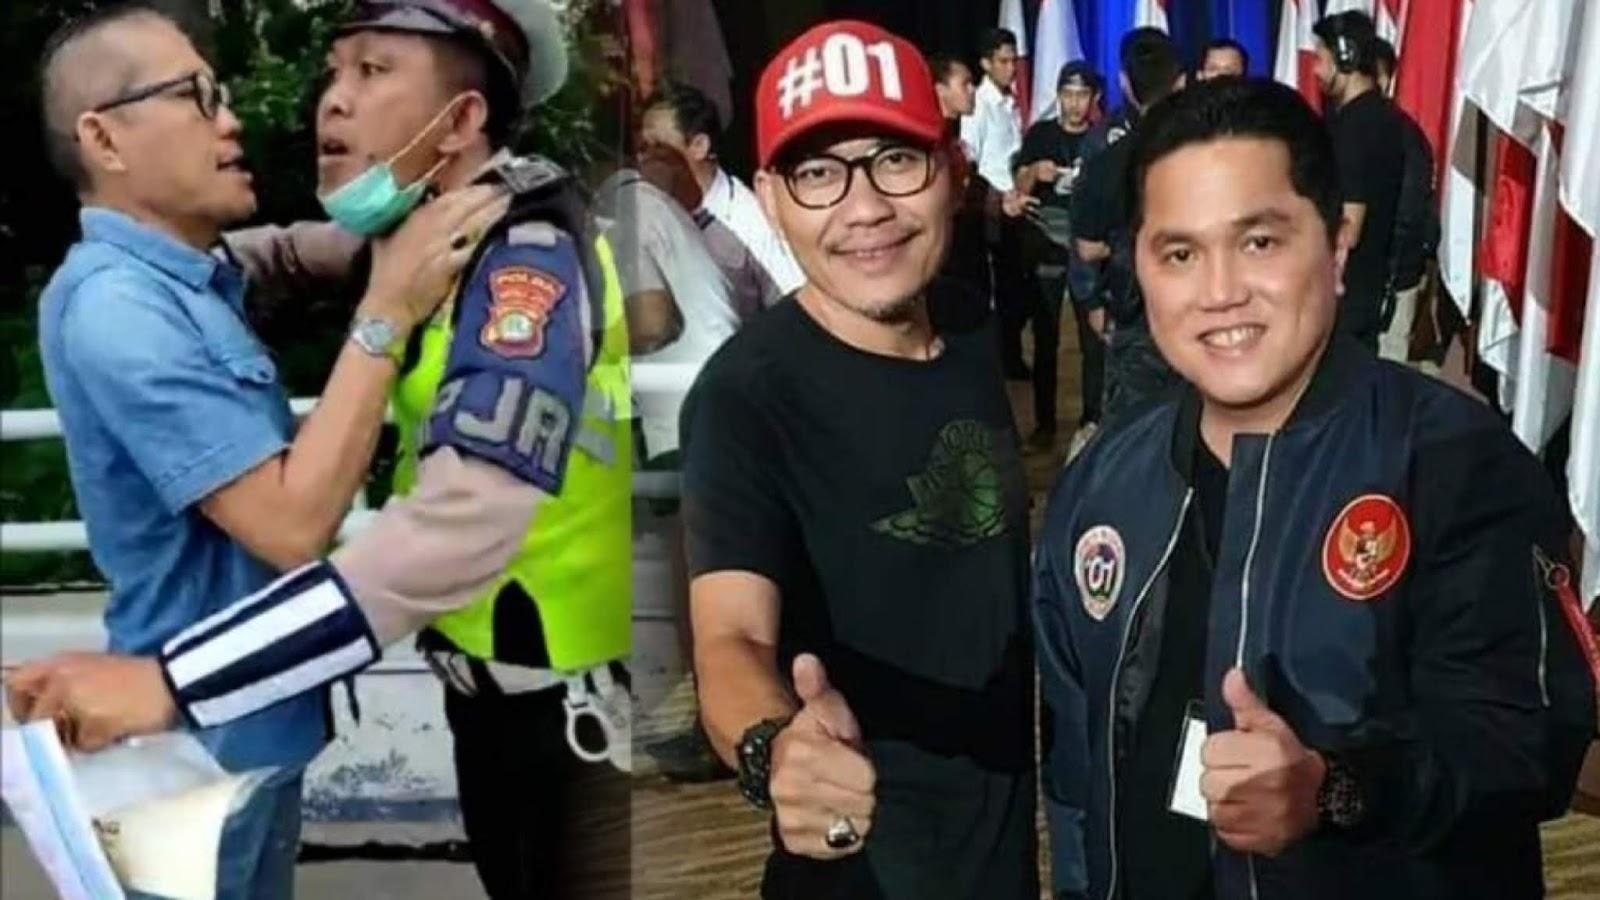 Pengendara Yang Cekik Polantas Ternyata Sekjen Rakyat Militan Jokowi